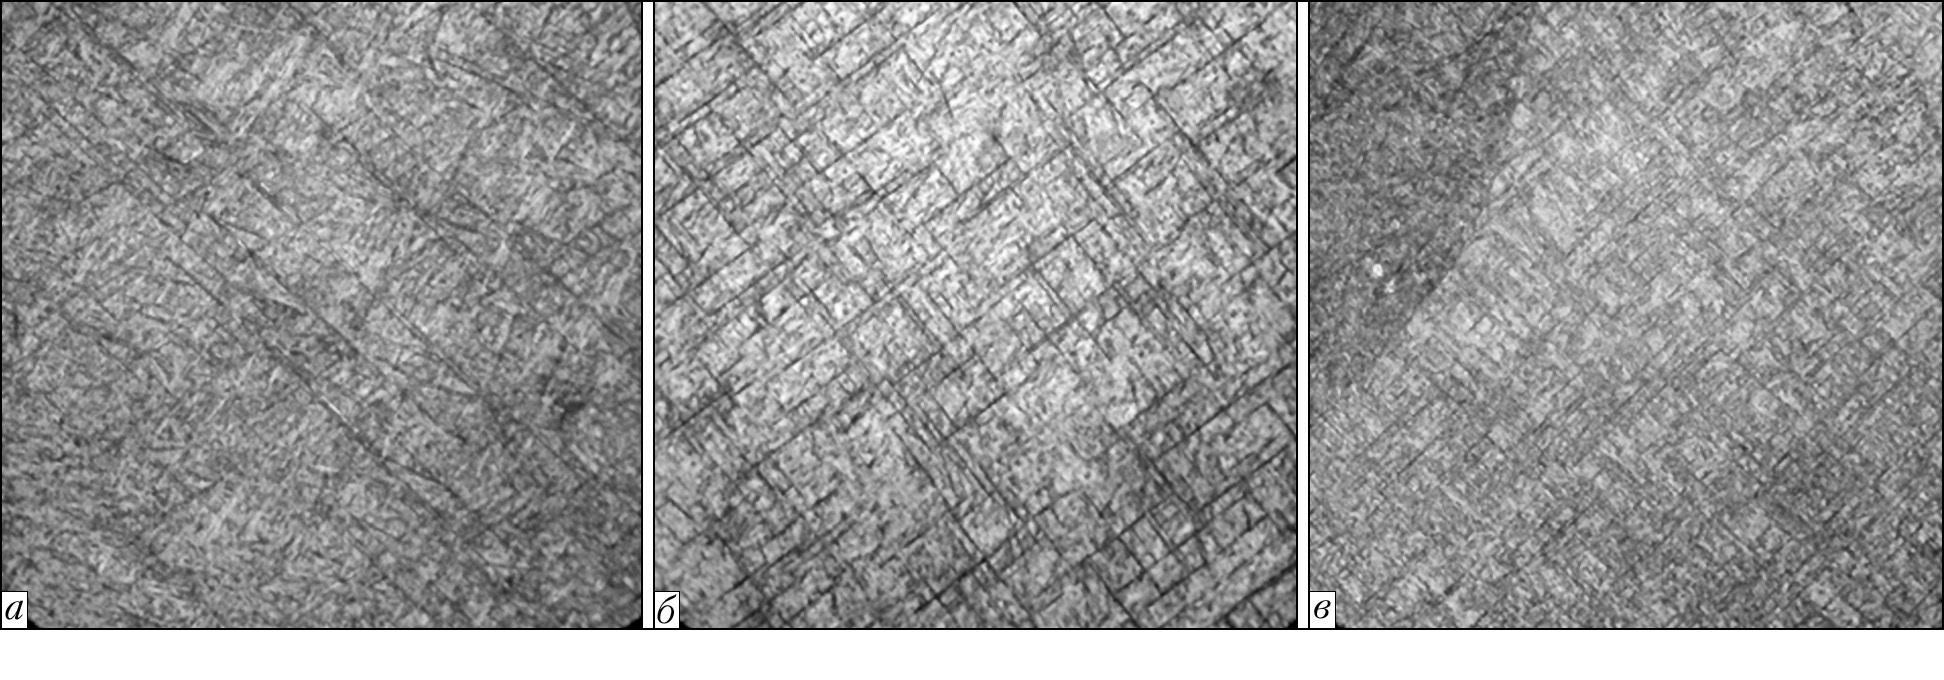 микроструктура металла сварного шва